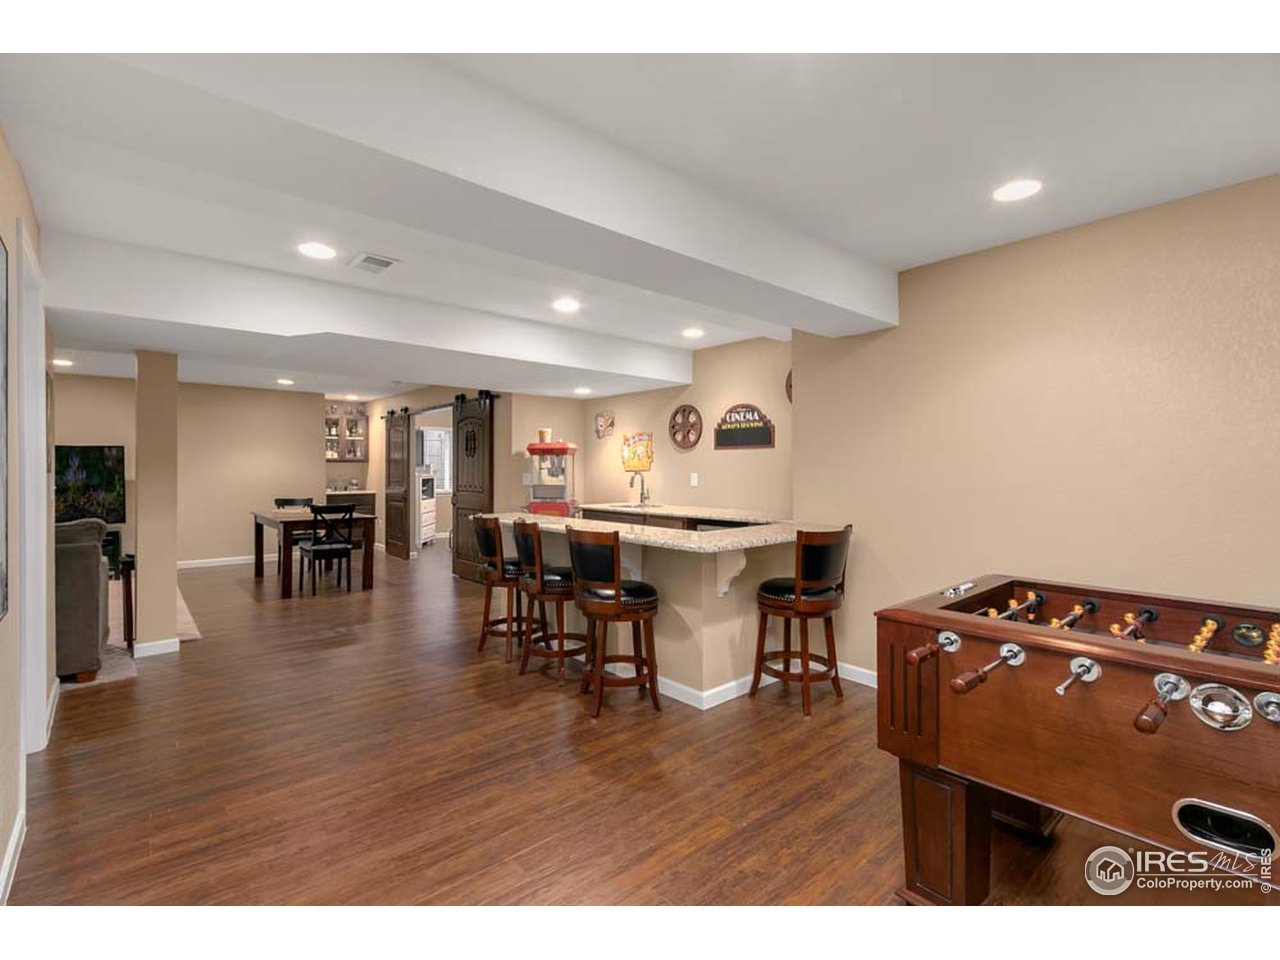 Full finished basement